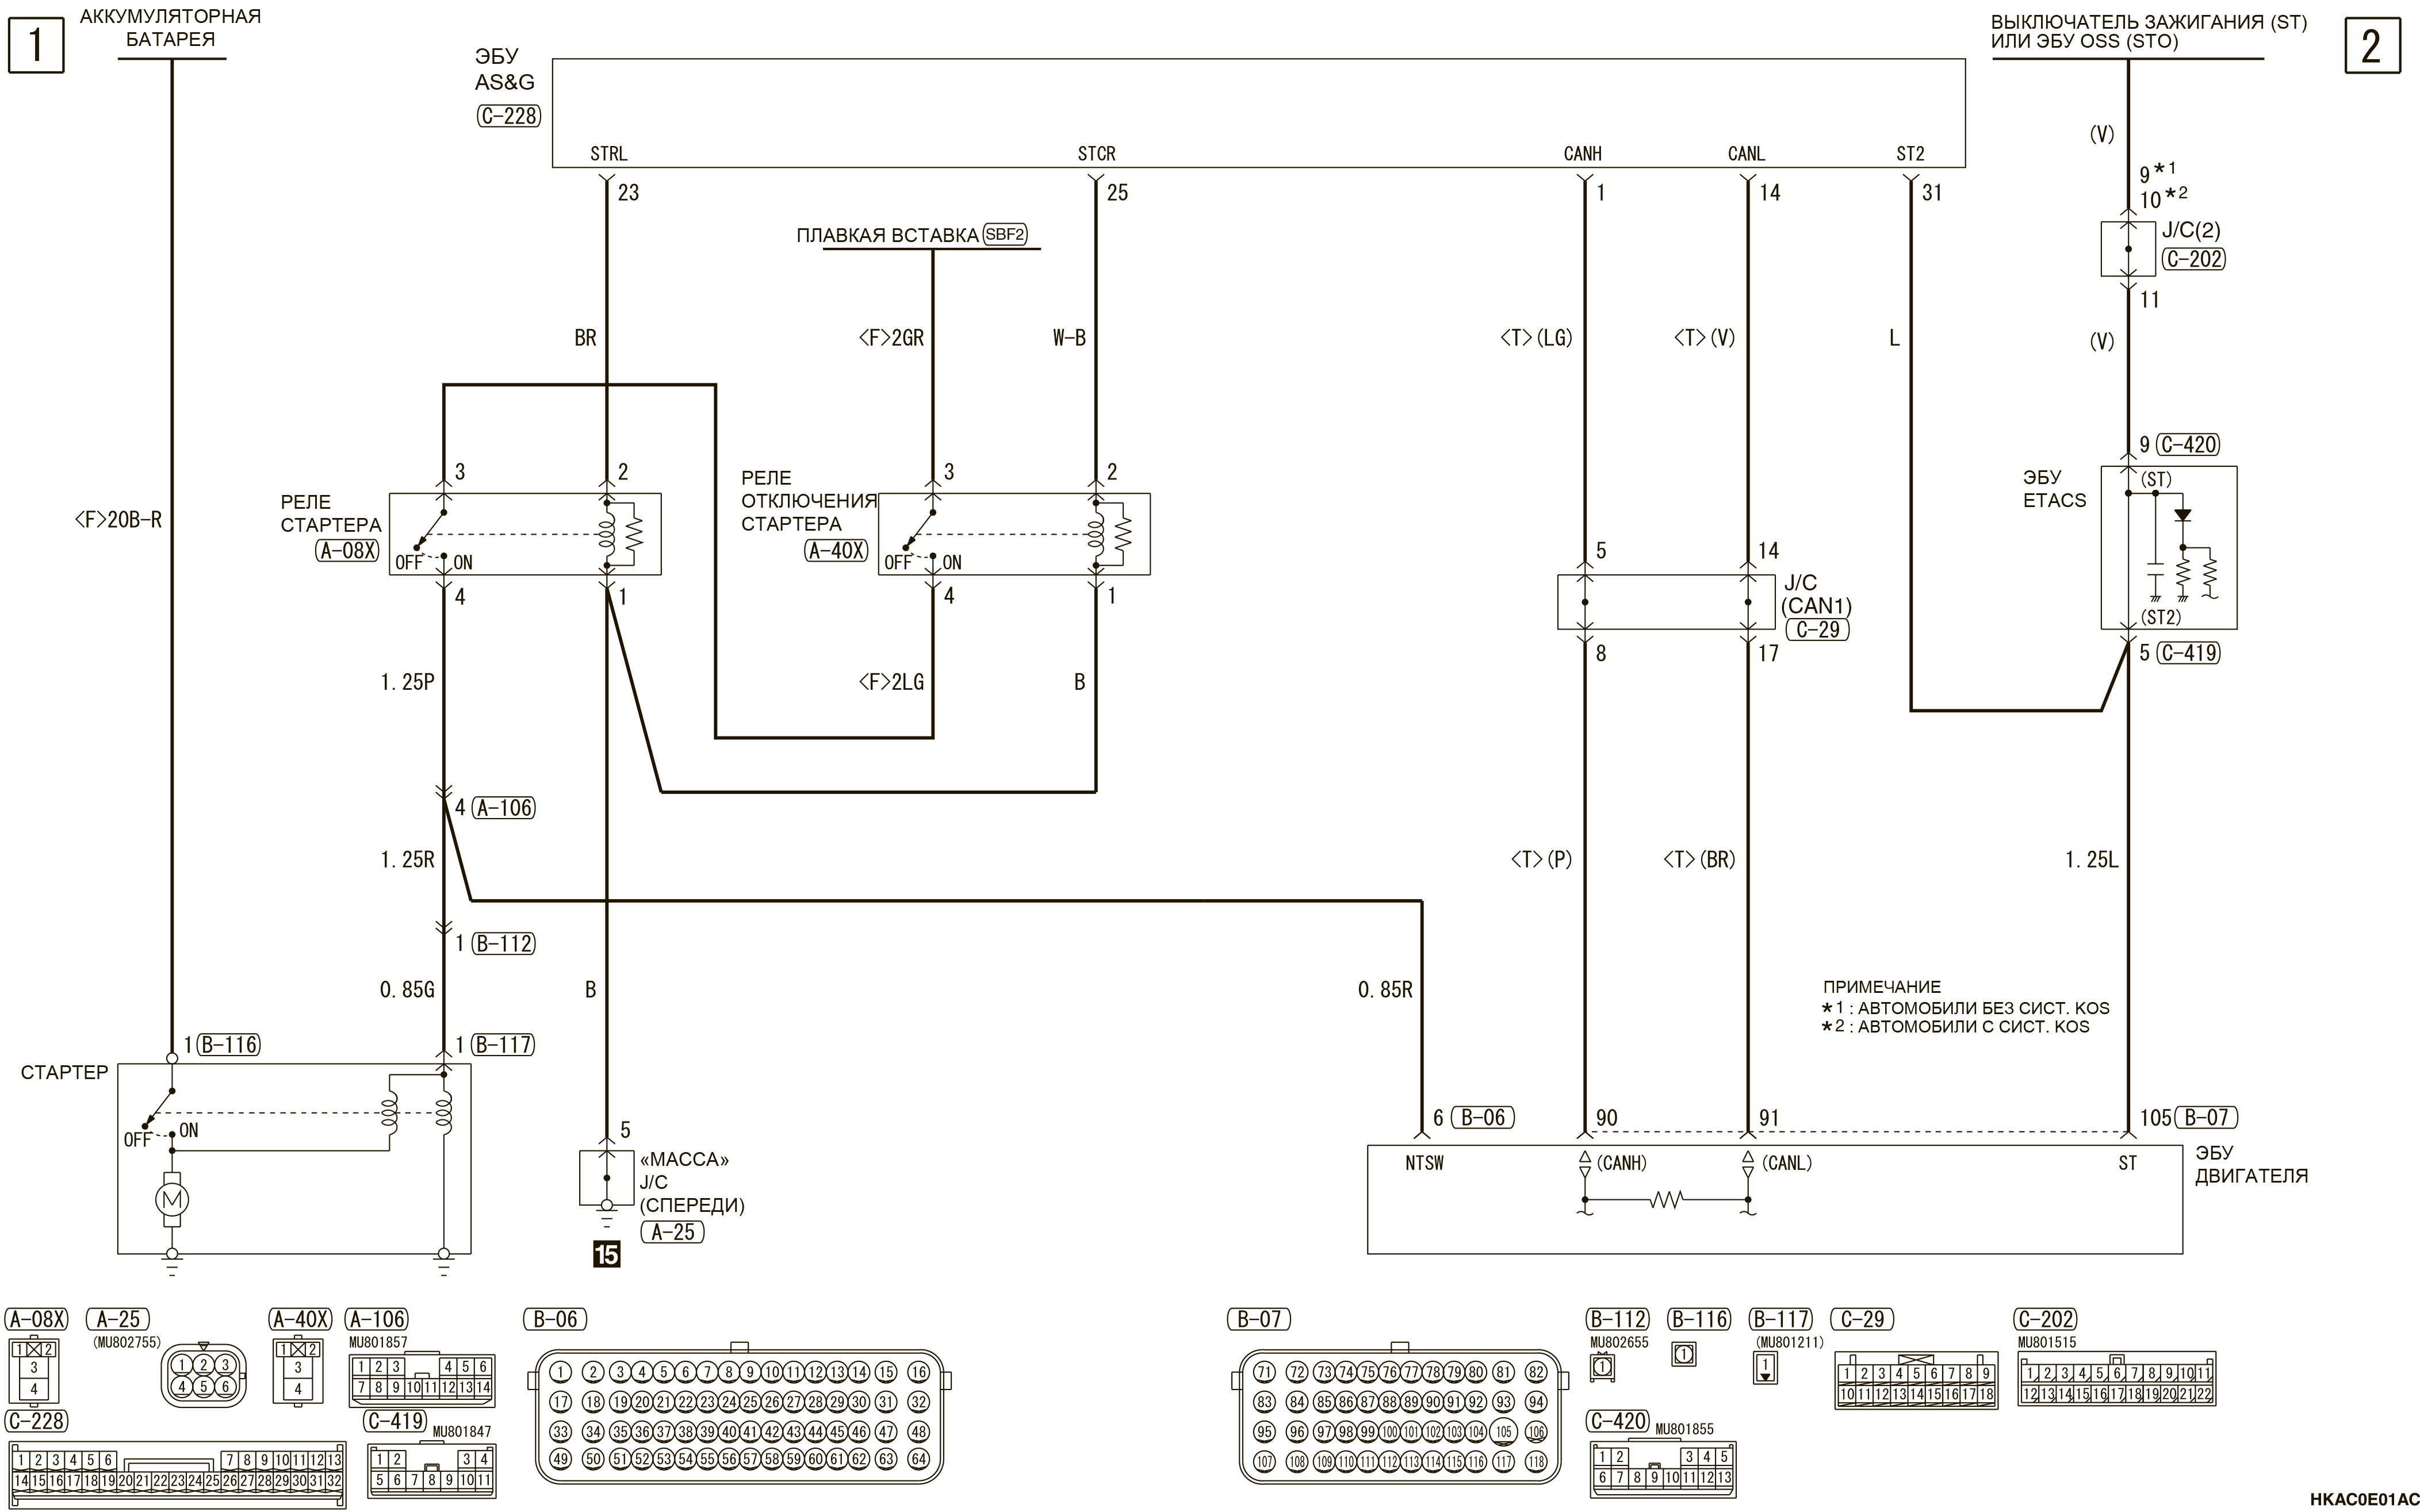 mmc аутлендер 3 2019 электросхемаСИСТЕМА ЭЛЕКТРОПУСКА 4J1-M/T (АВТОМОБИЛИ С СИСТЕМОЙ AS&G)